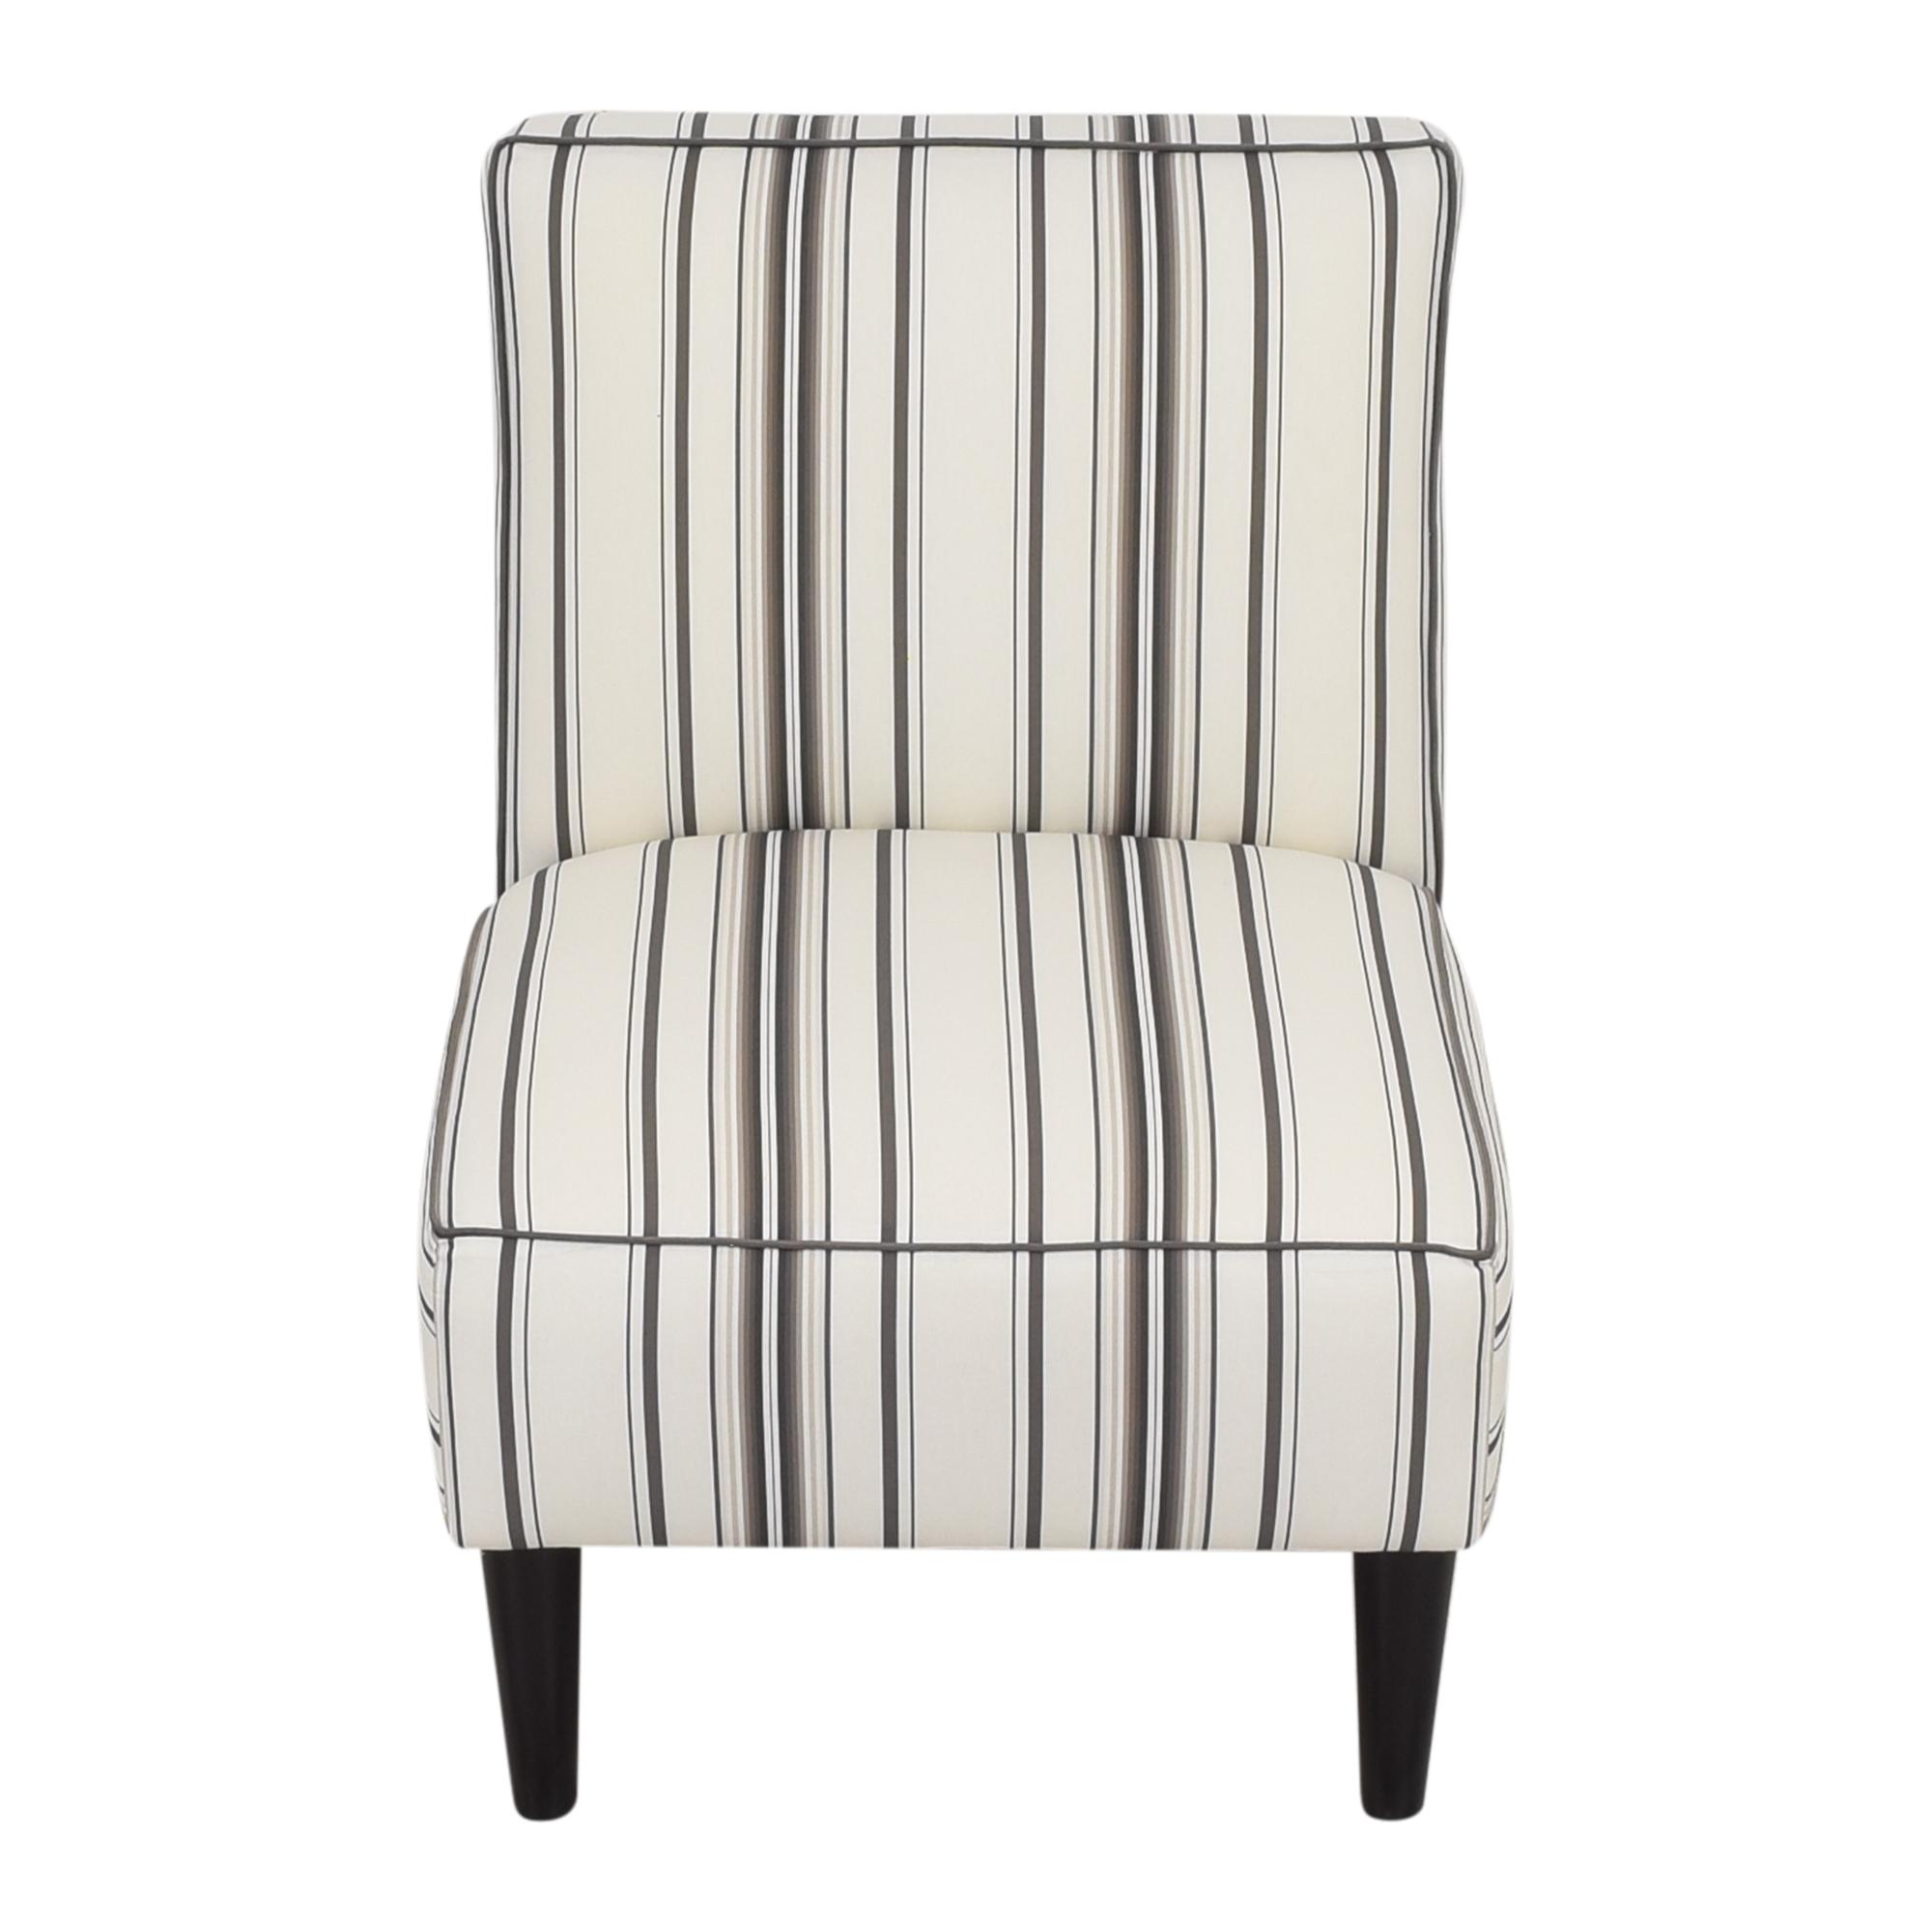 The Inside The Inside Slipper Chair price